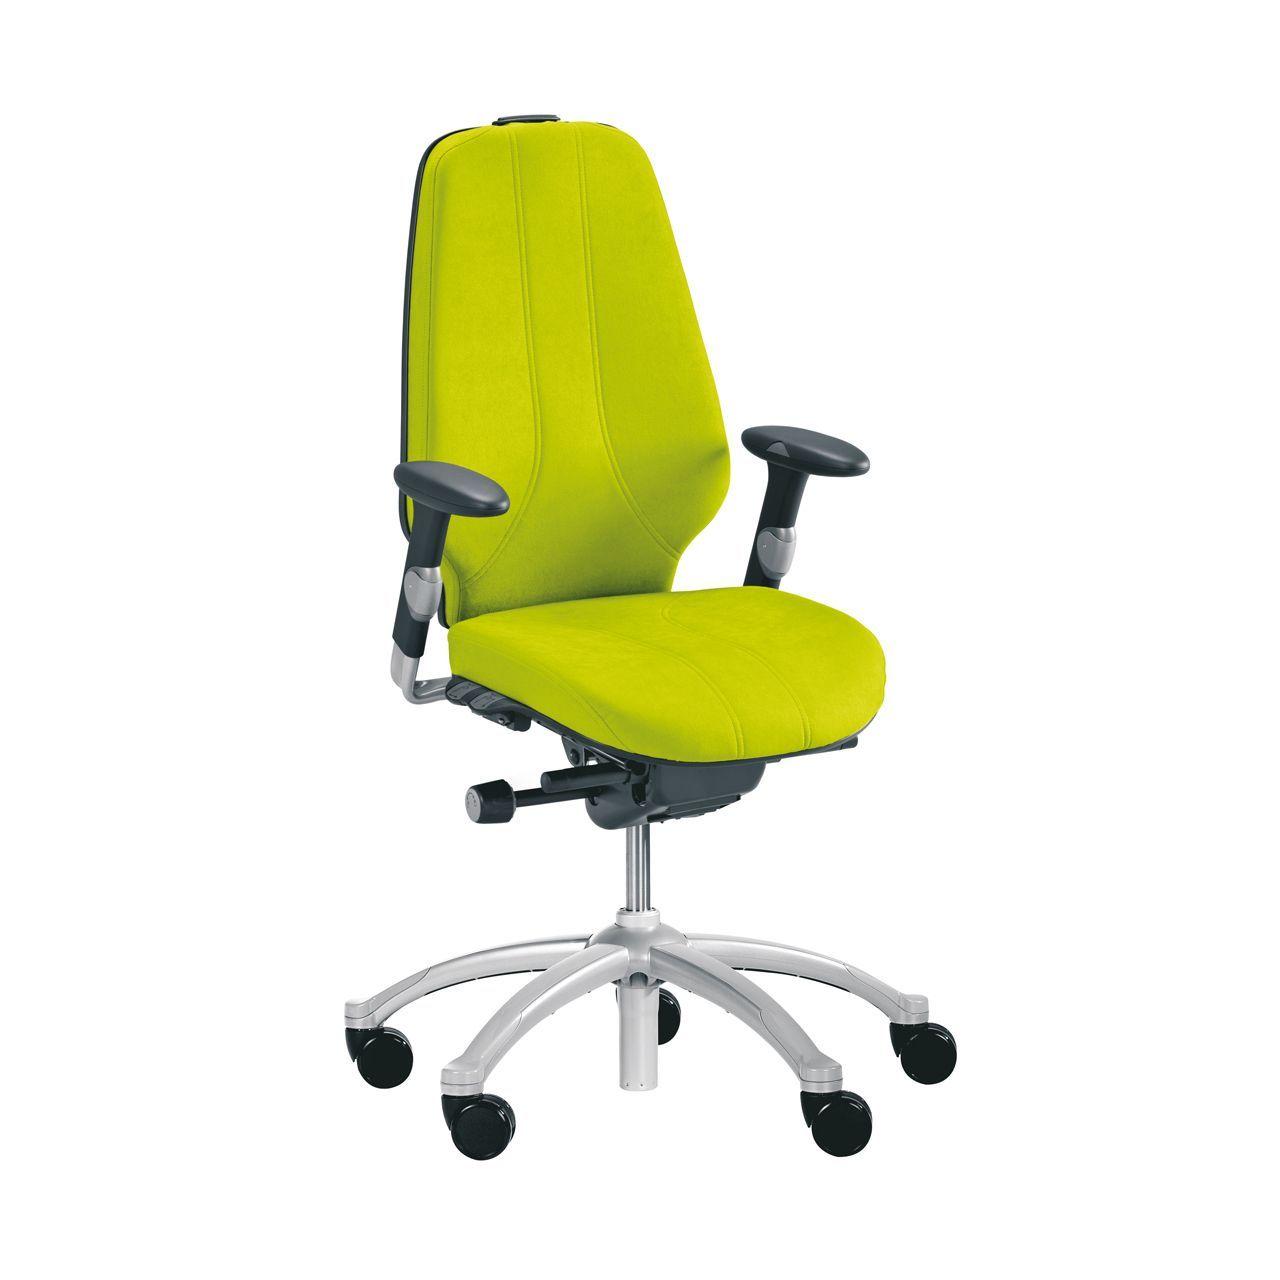 rh logic 400 24 7 ergonomische bureaustoel STKARH303 Geel